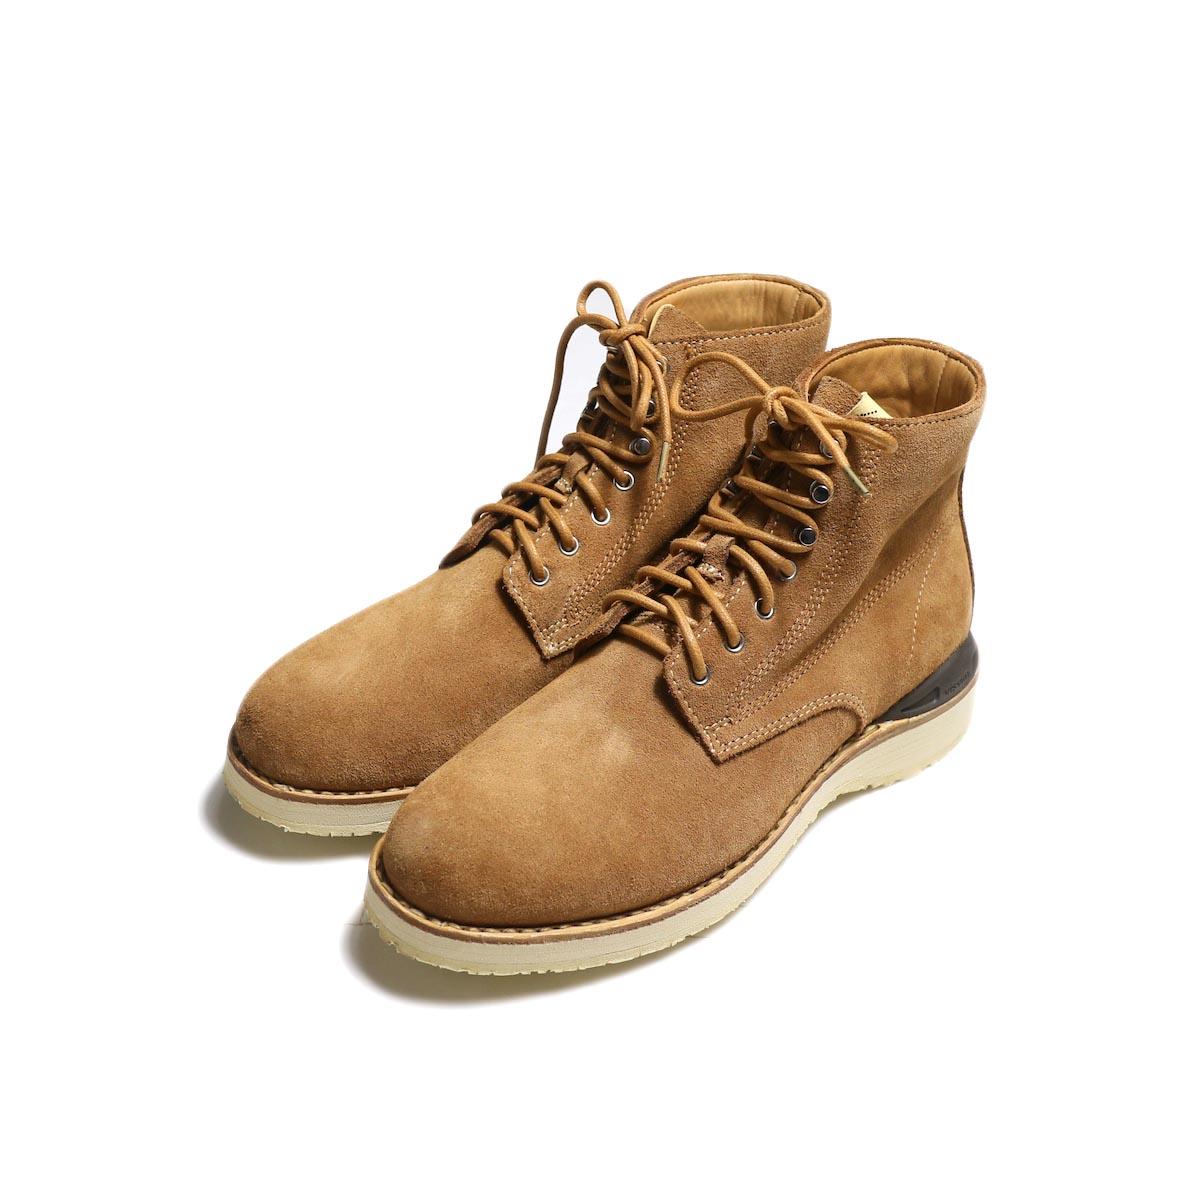 visvim / VIRGIL BOOTS-FOLK (Brown)全体